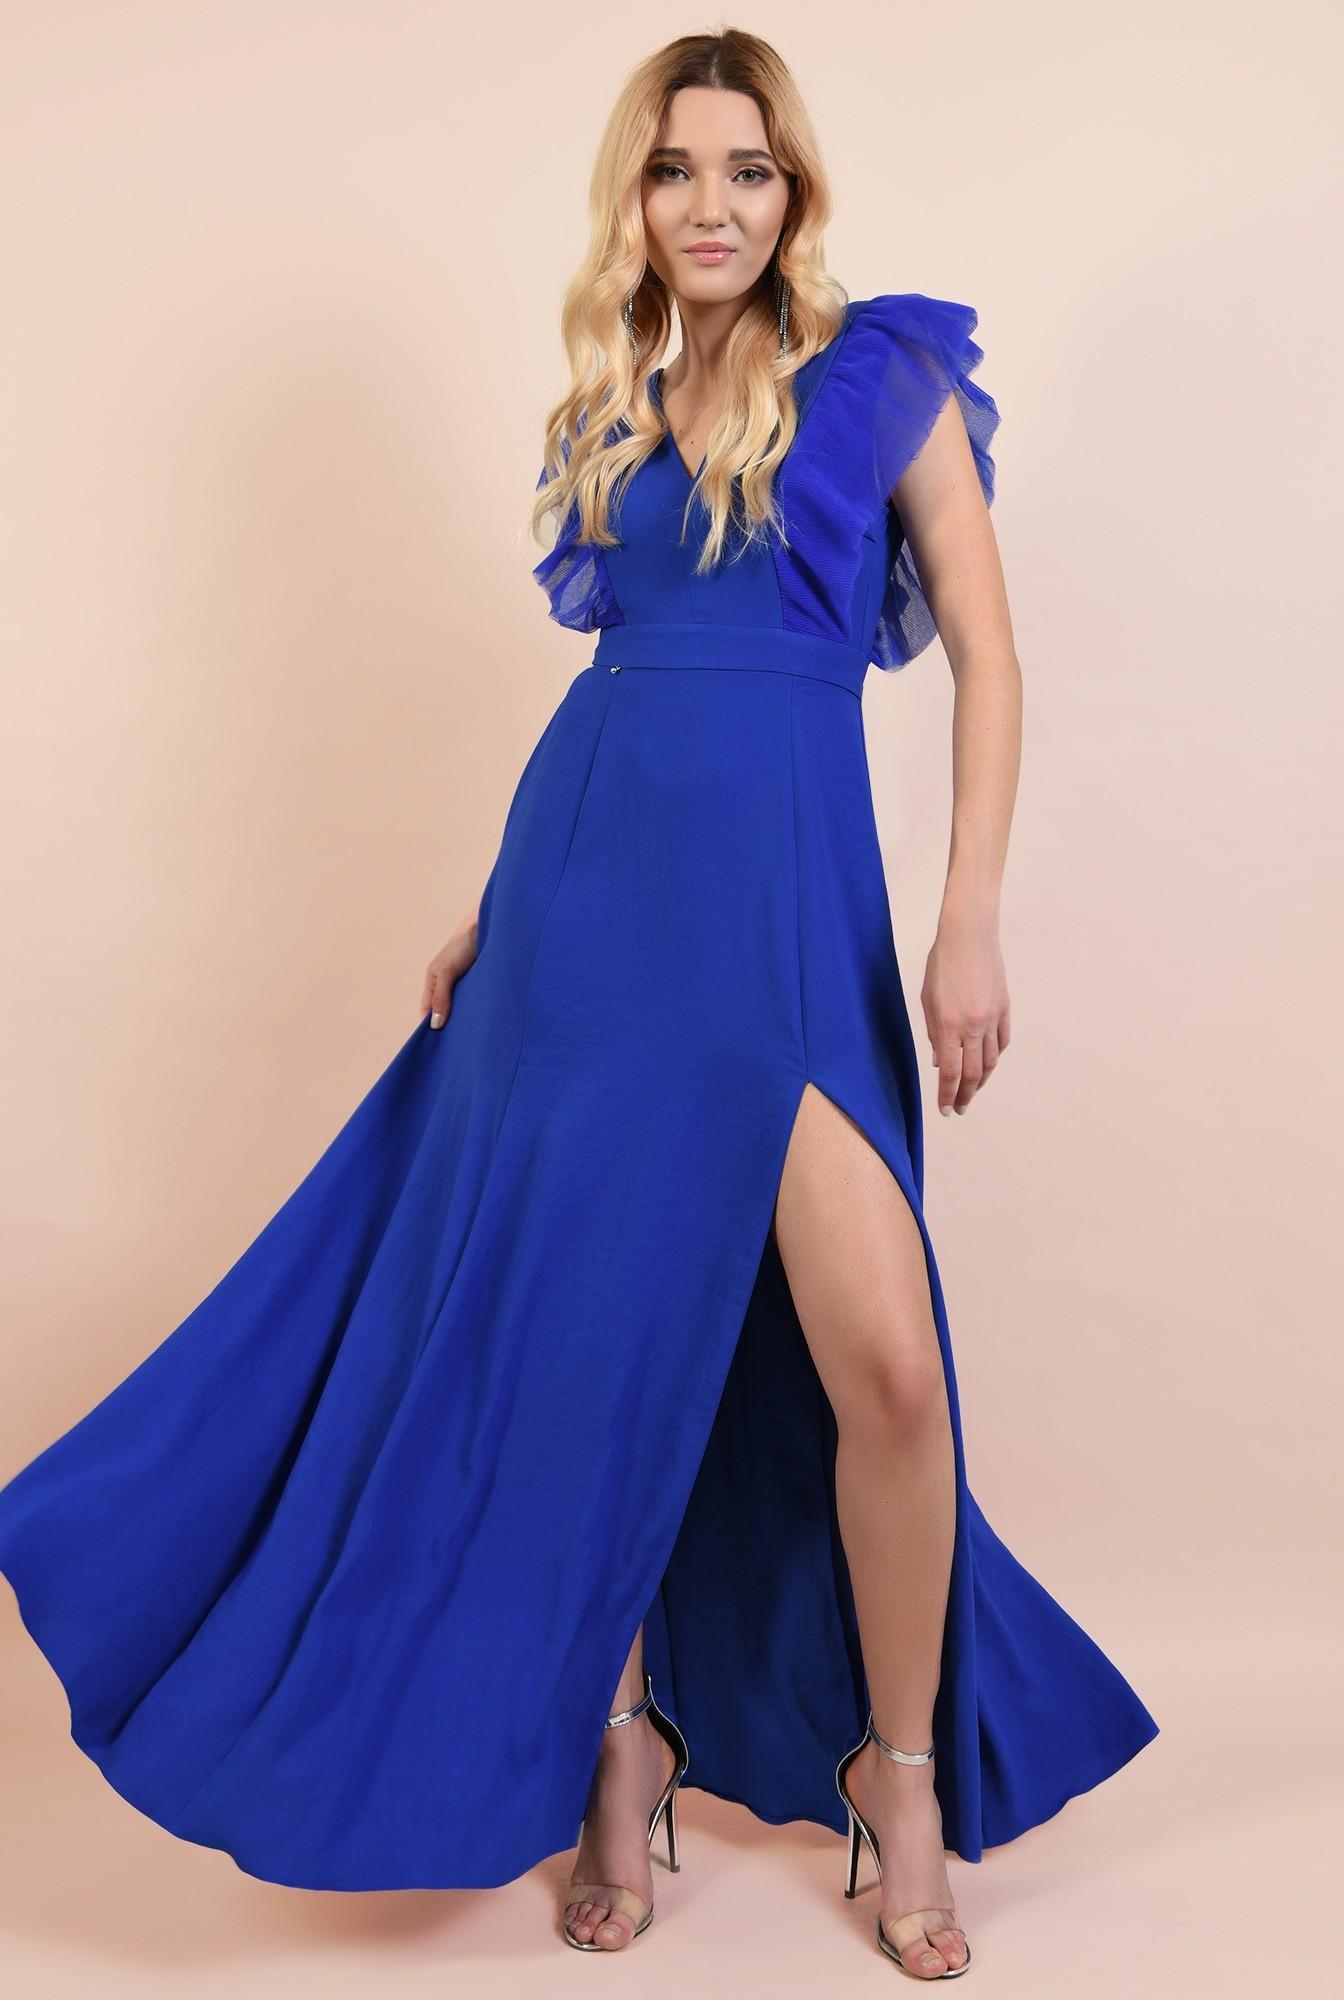 0 - rochie eleganta, lunga, cu anchior, slit, funda la spate